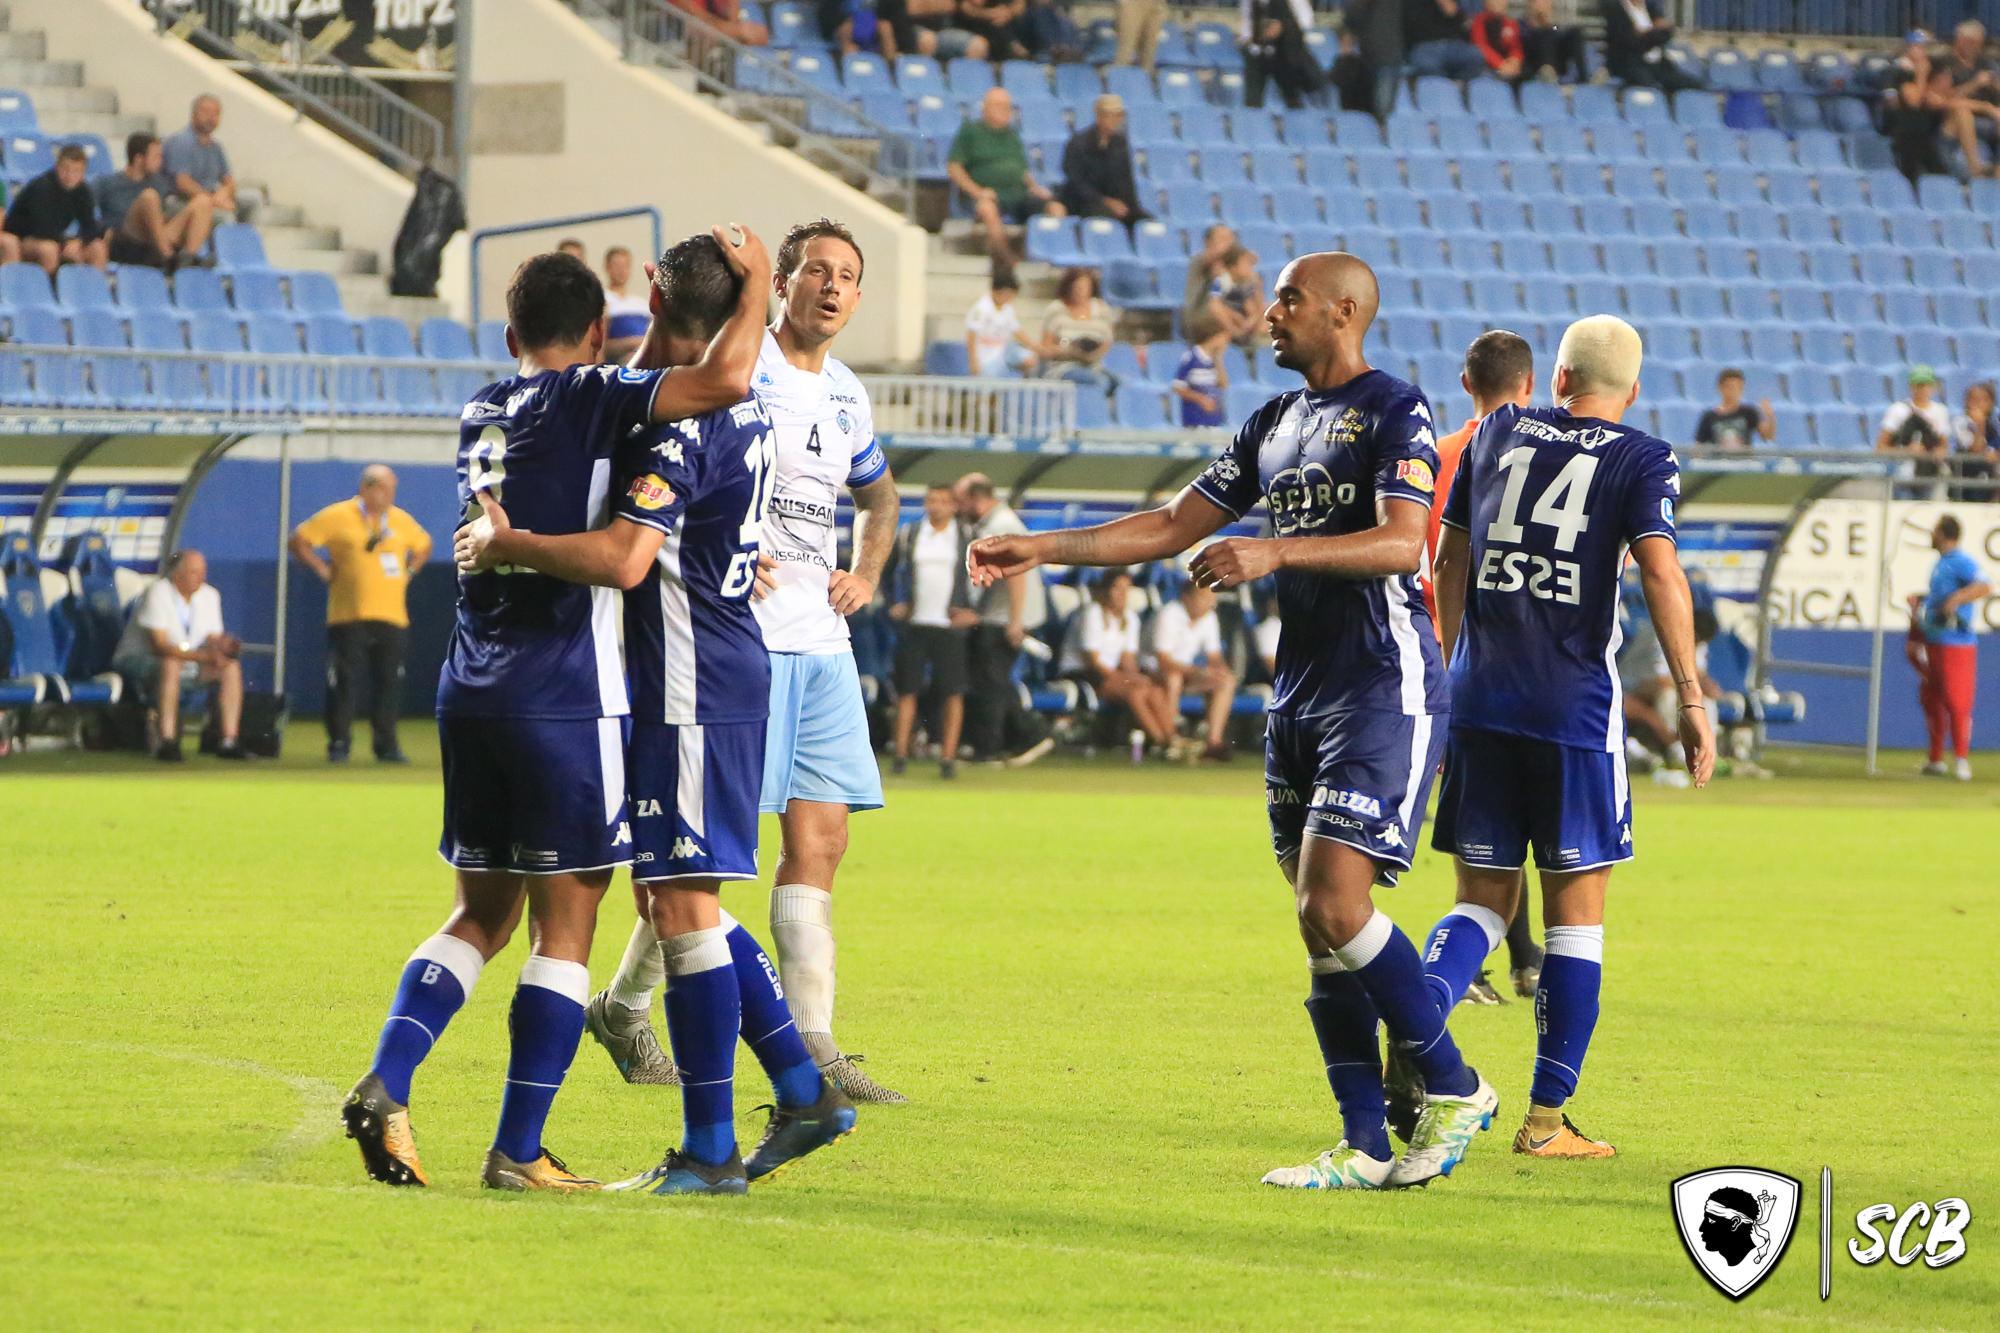 SCB 3-0 EFB (23/09/2018)